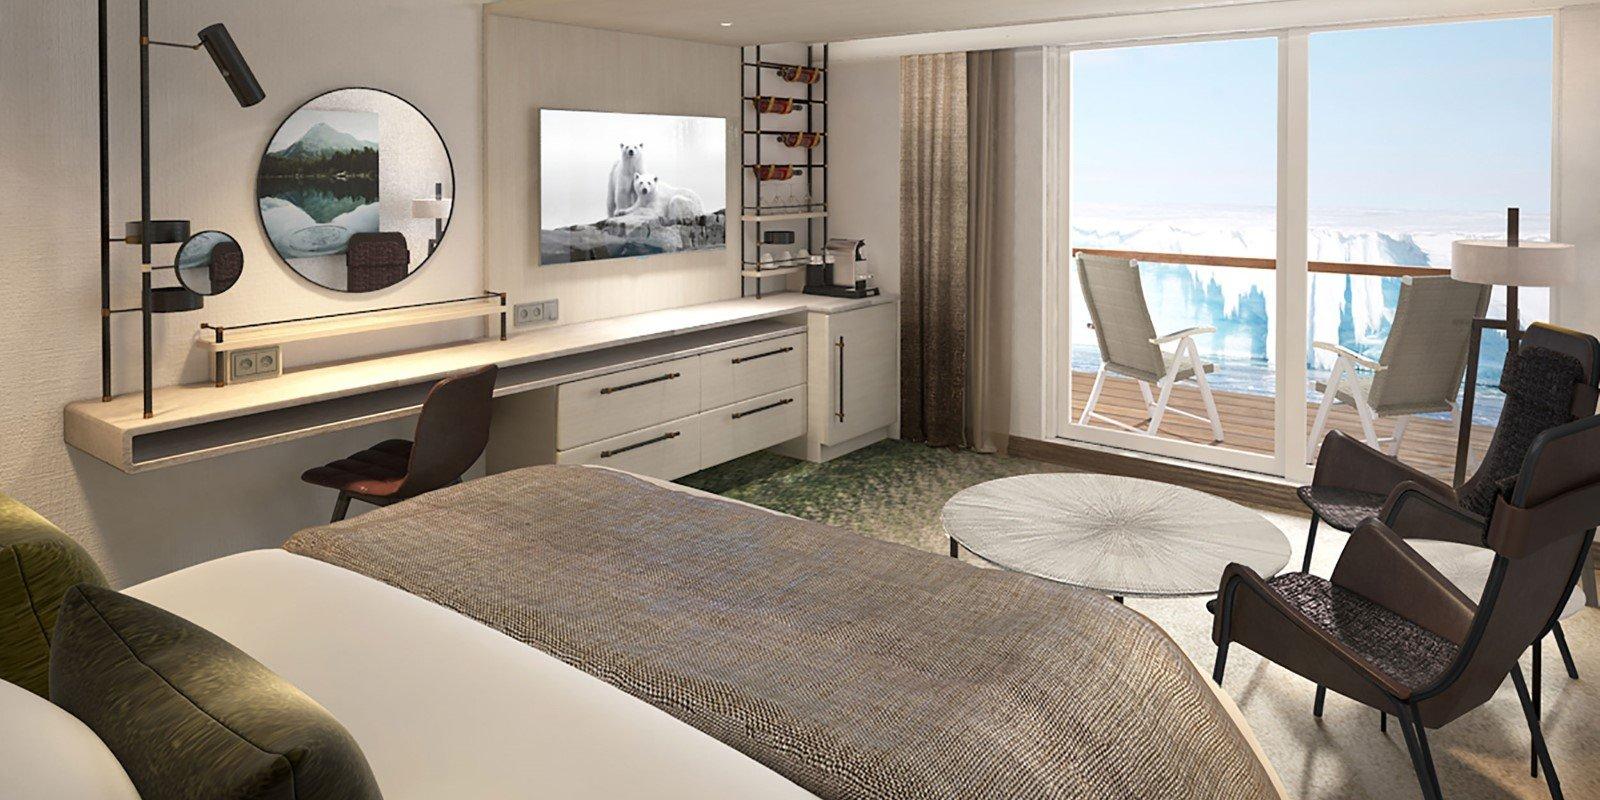 Balcony-Suite-View-2.jpg